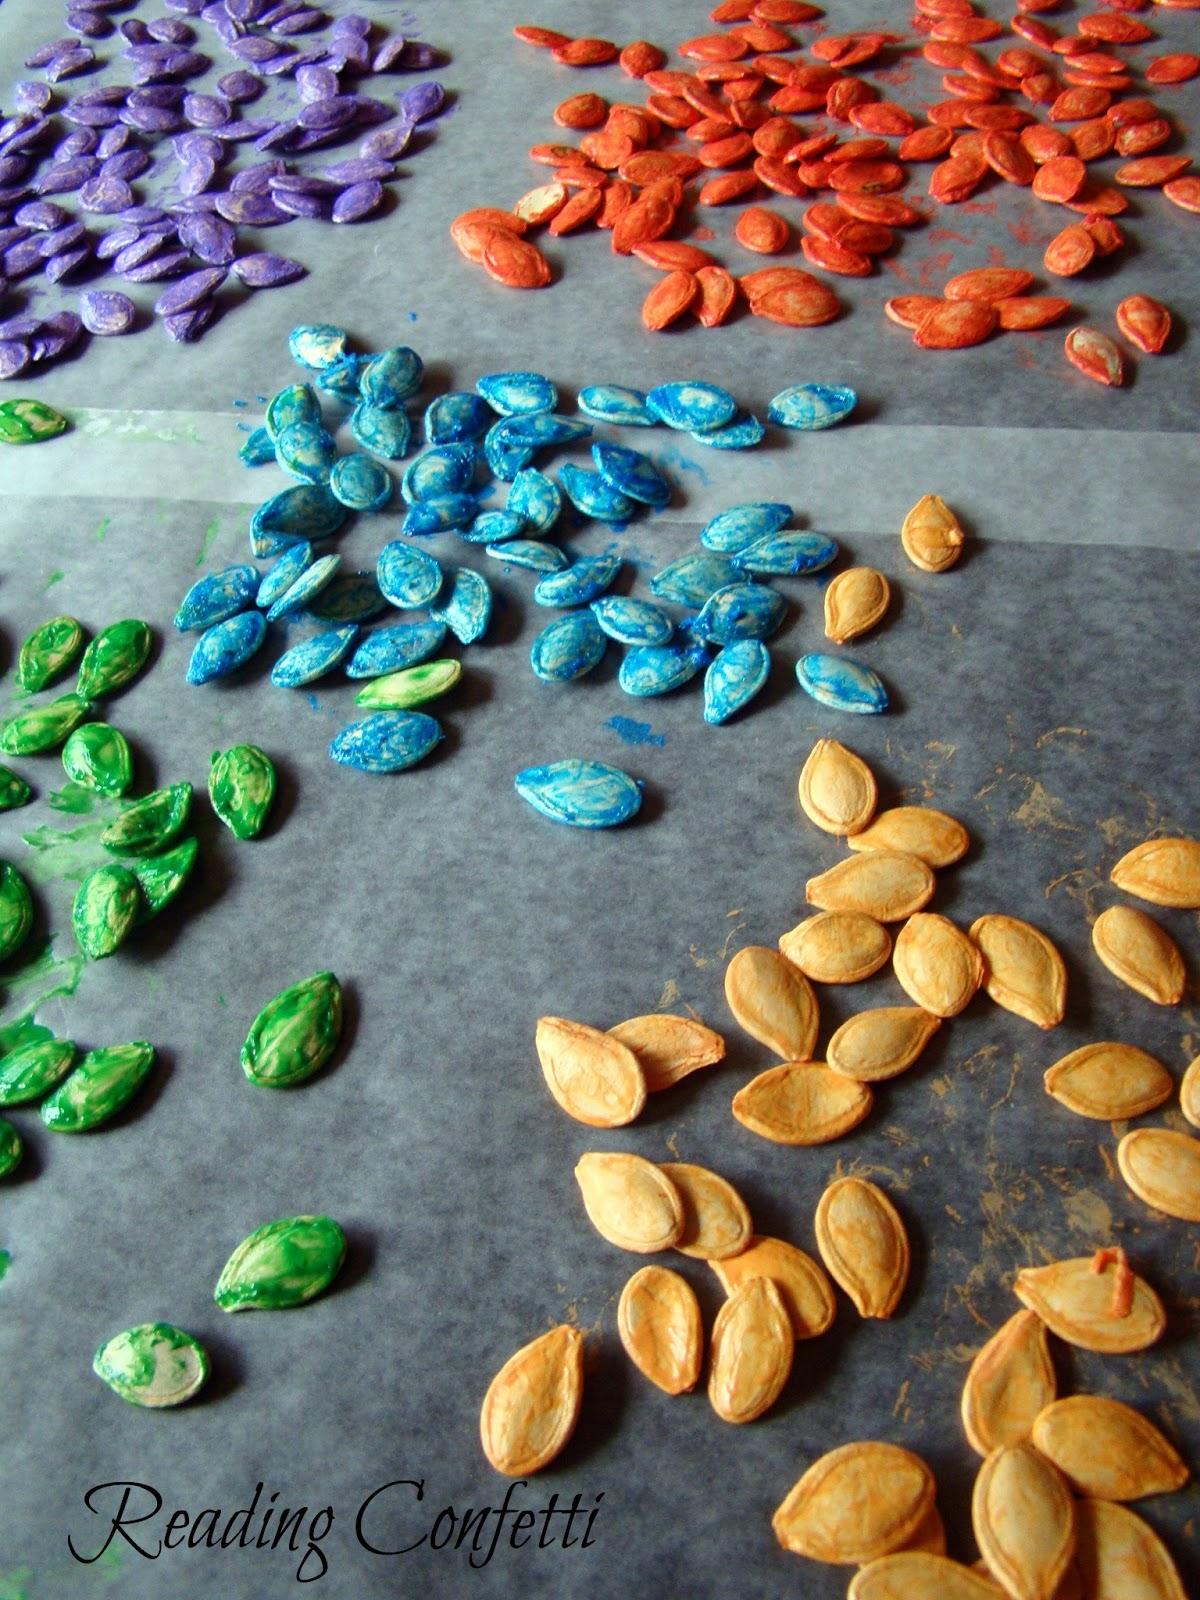 Pumpkin Seed Art Reading Confetti